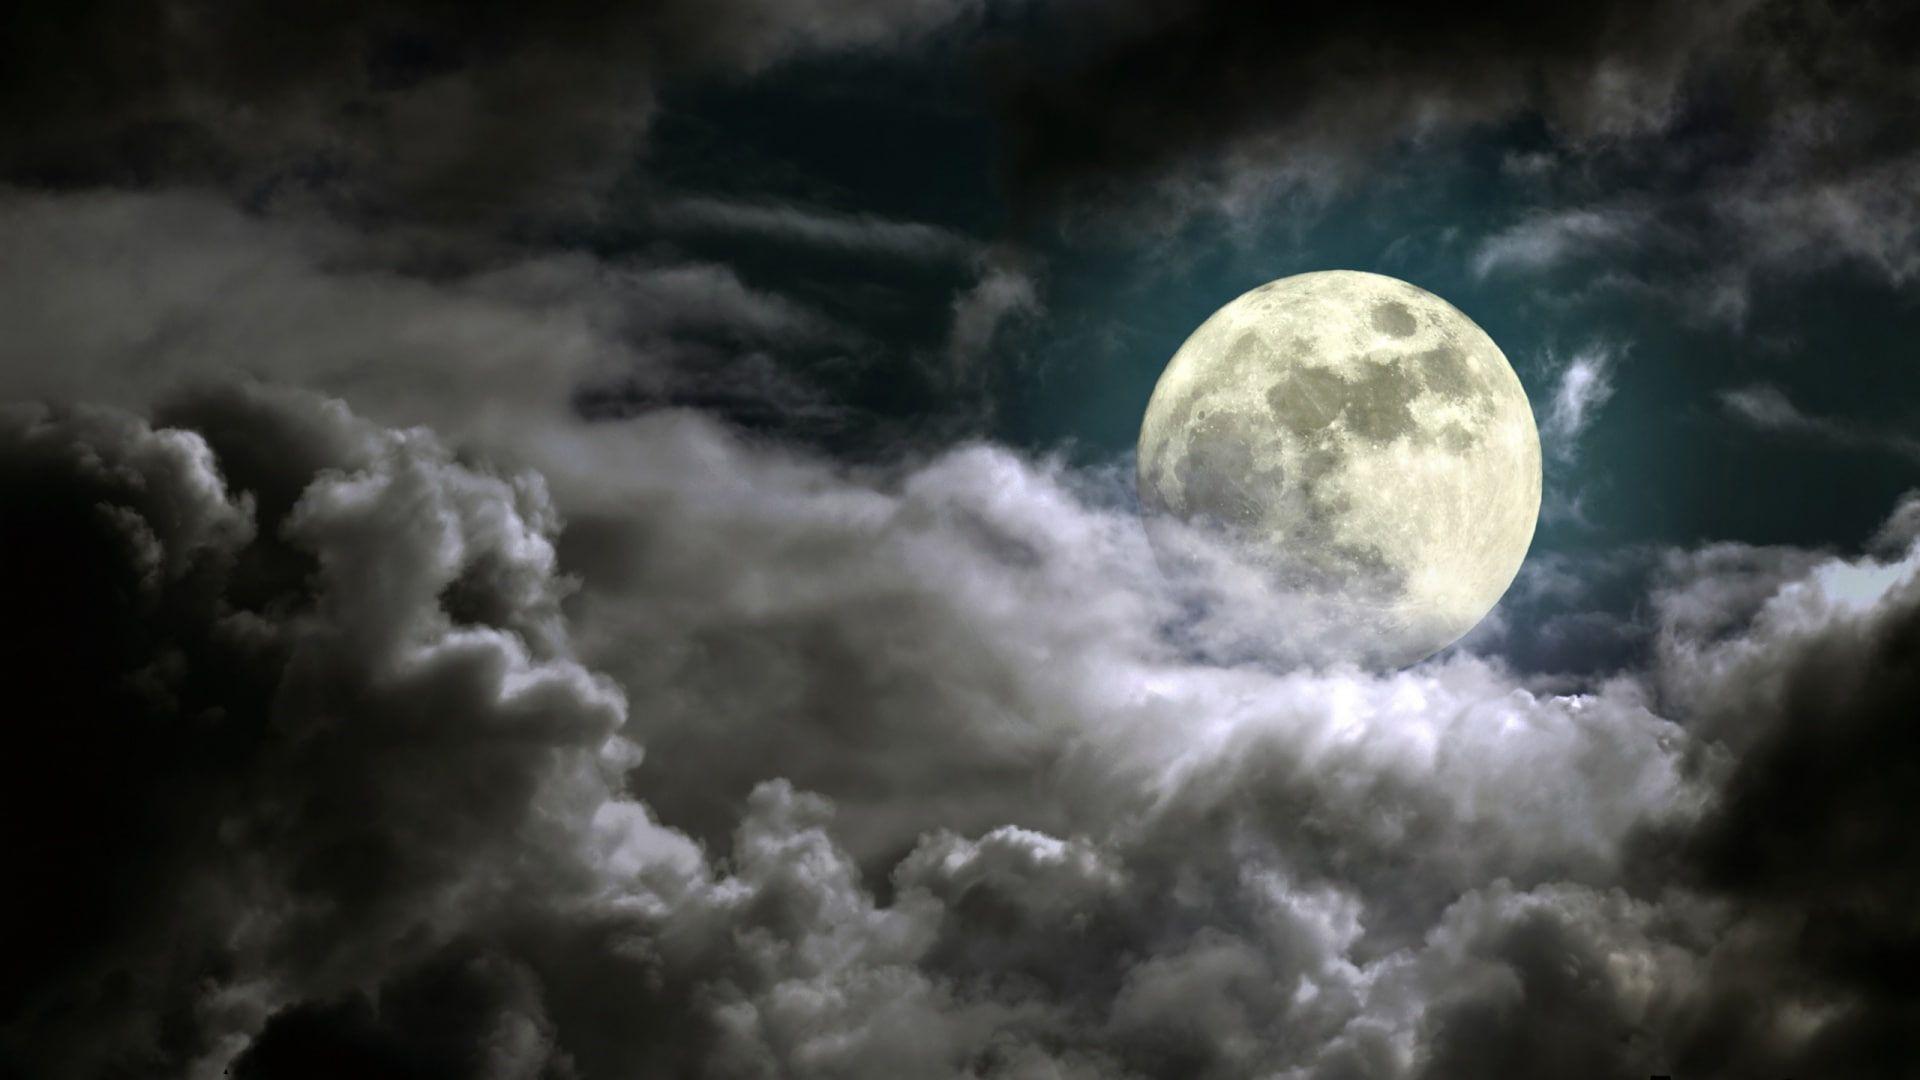 Nature Full Moon Dark Moonlight Sky Clouds Nature Full Moon Dark Moonlight Sky Clouds 1080p Wallpaper Hdwal Cloud Wallpaper Cold Moon Night Clouds